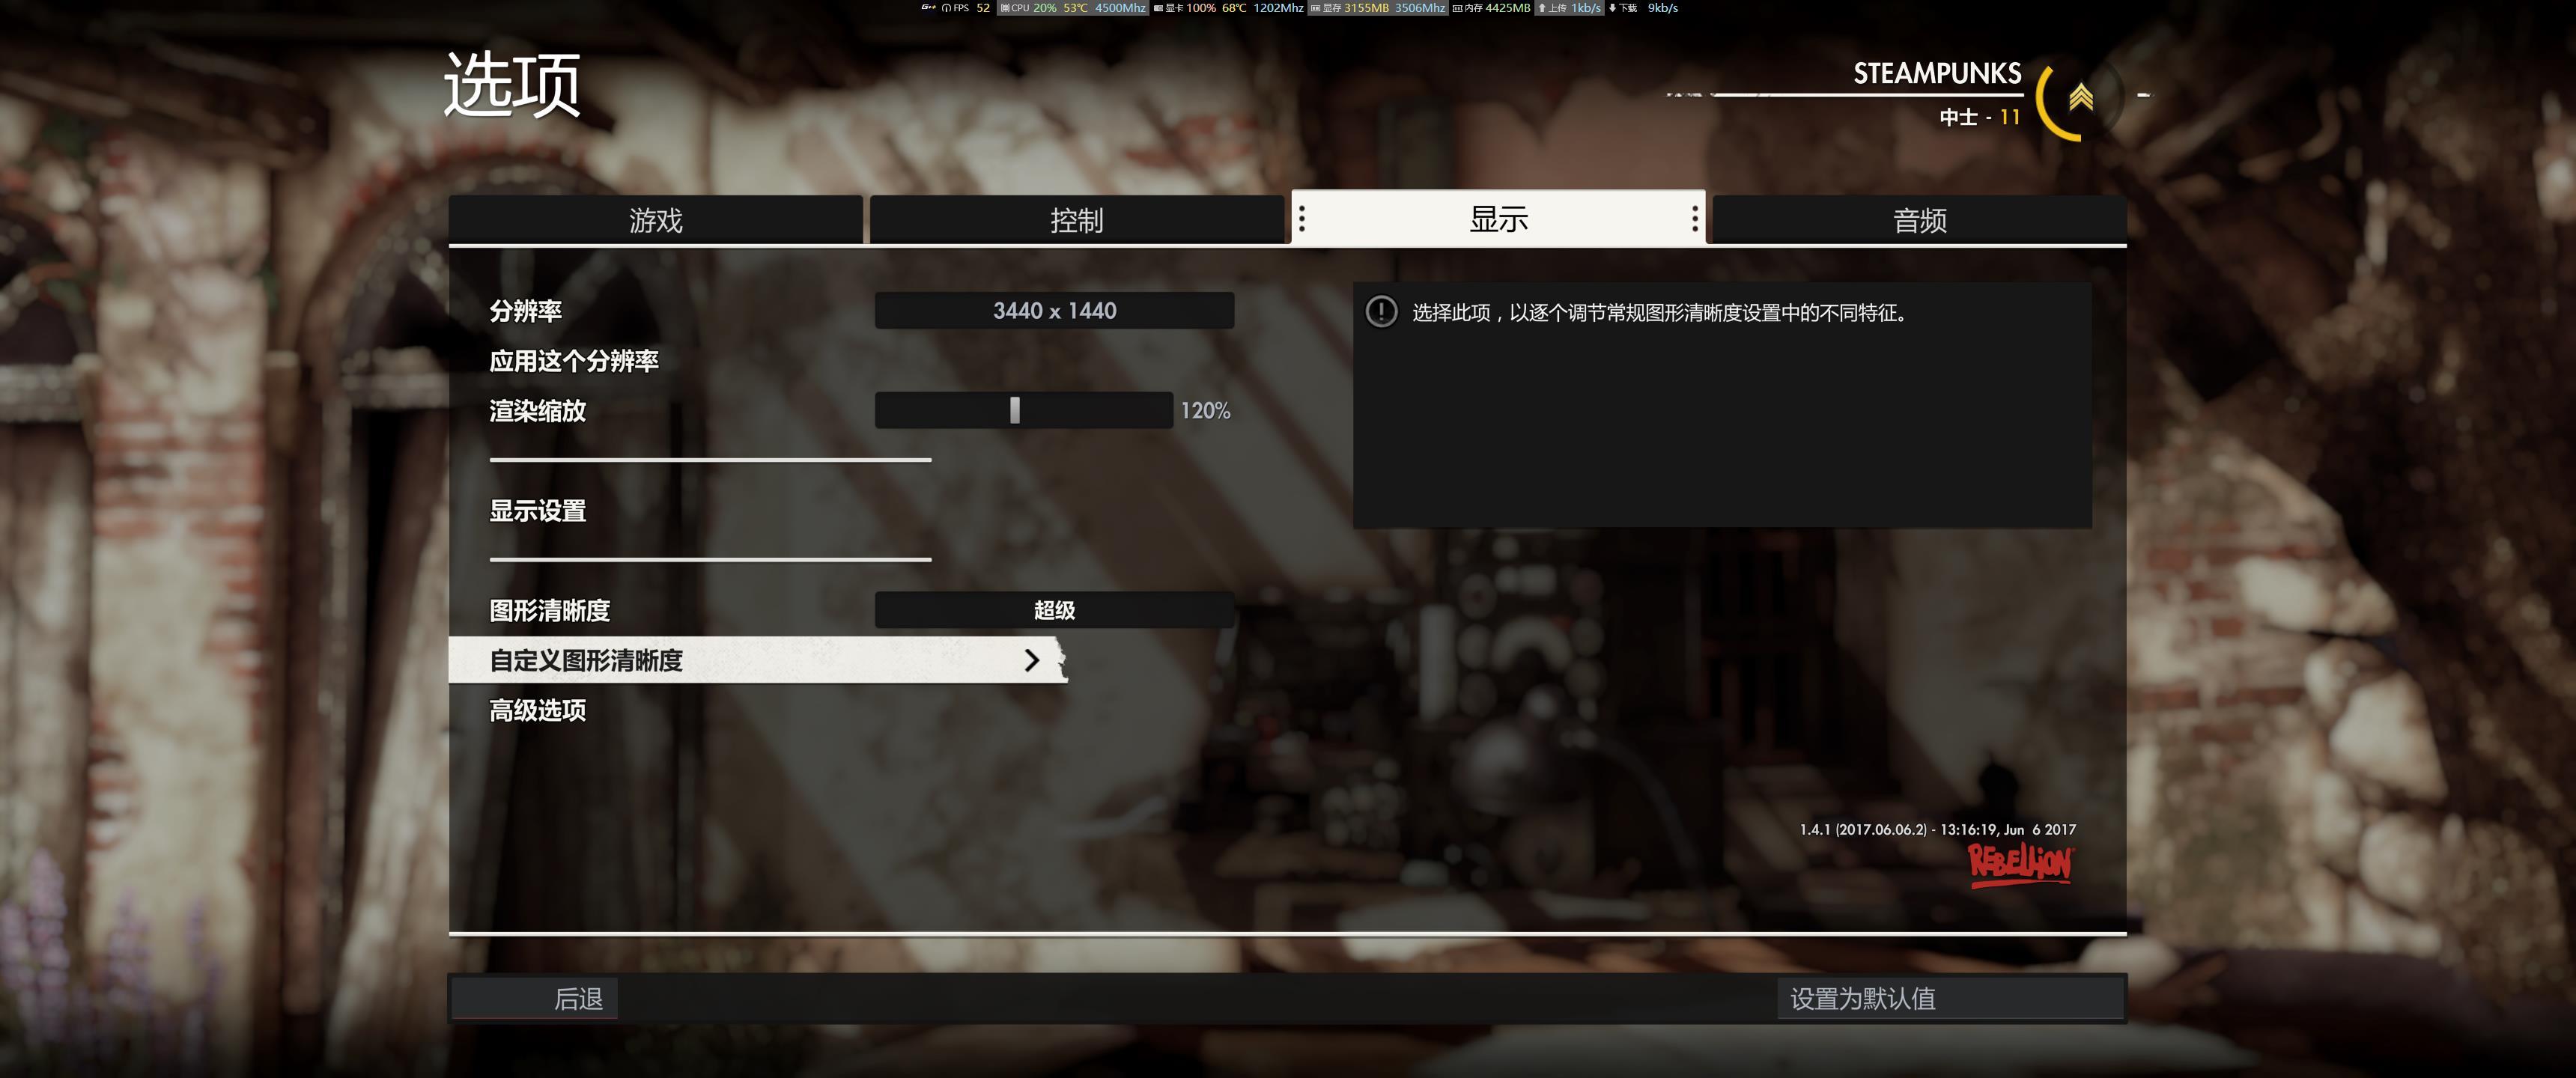 SniperElite4_DX11-01-20-33-53.jpg